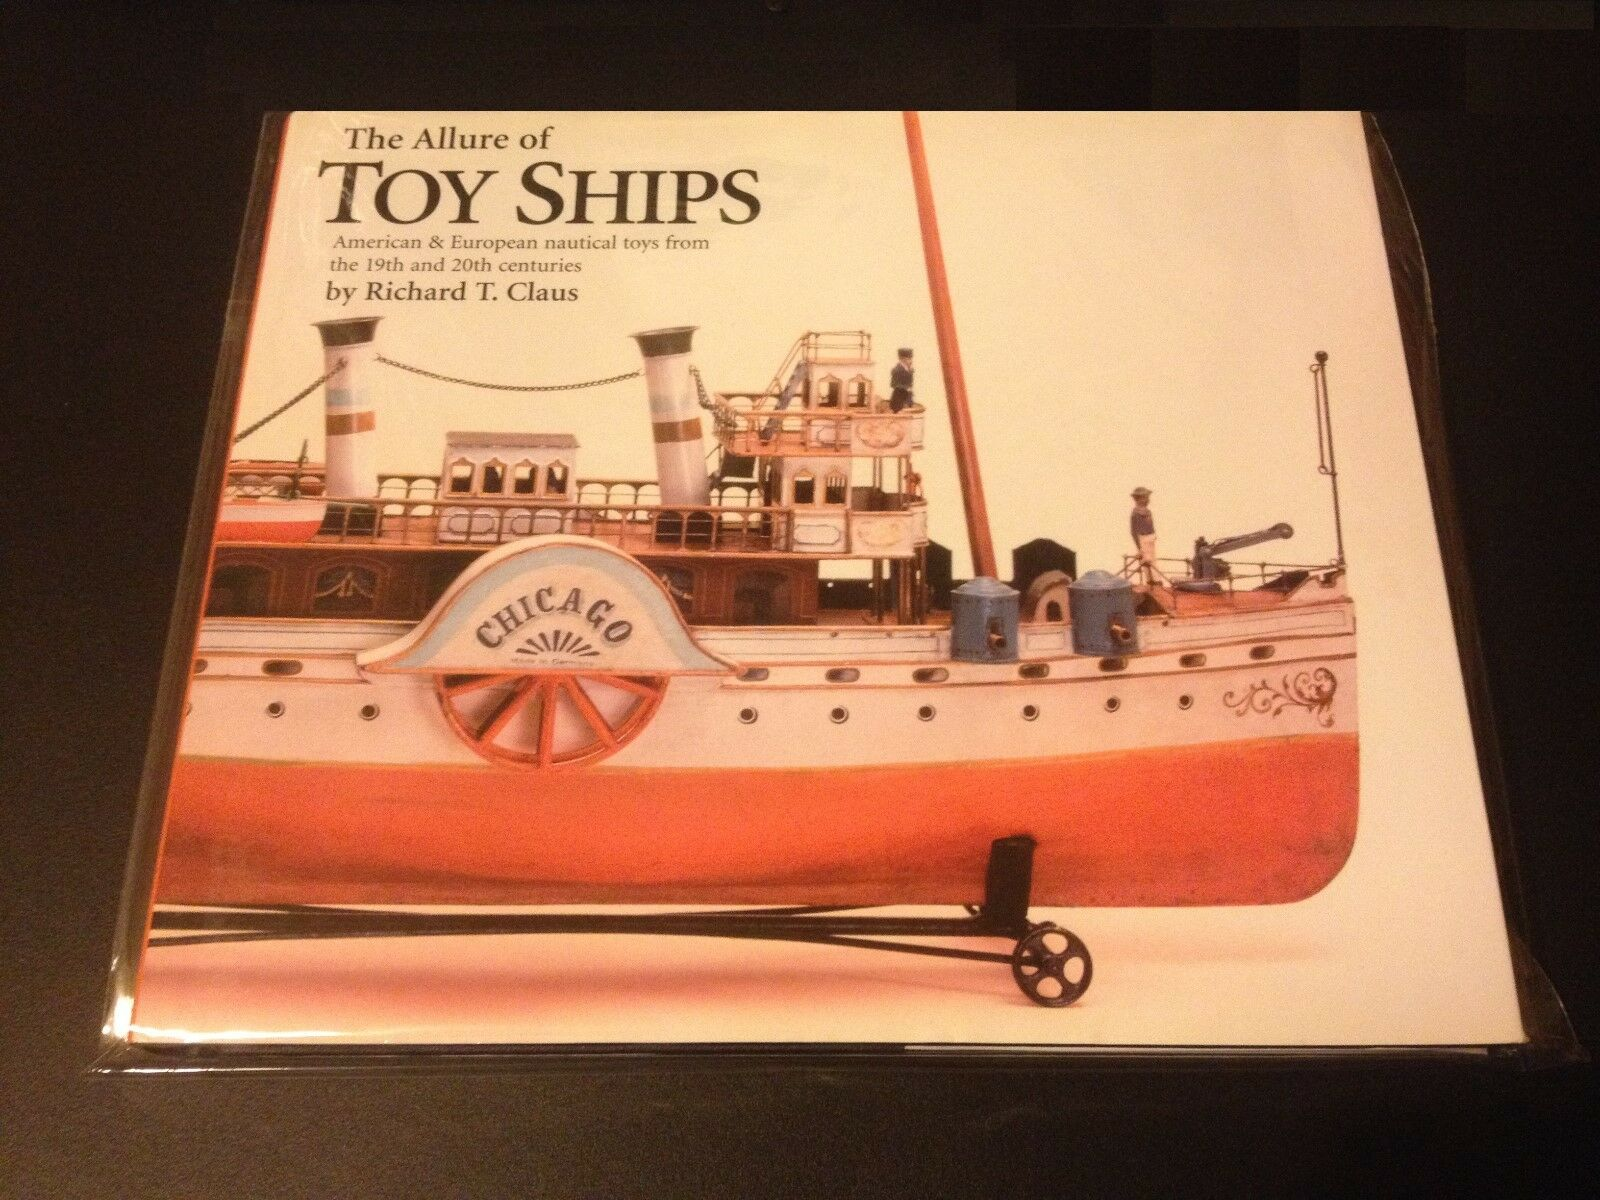 Libro Raro Allure De Juguete barcos 2005 Vintage Náutica Barco Juguetes DE HOJALATA MARKLIN Claus